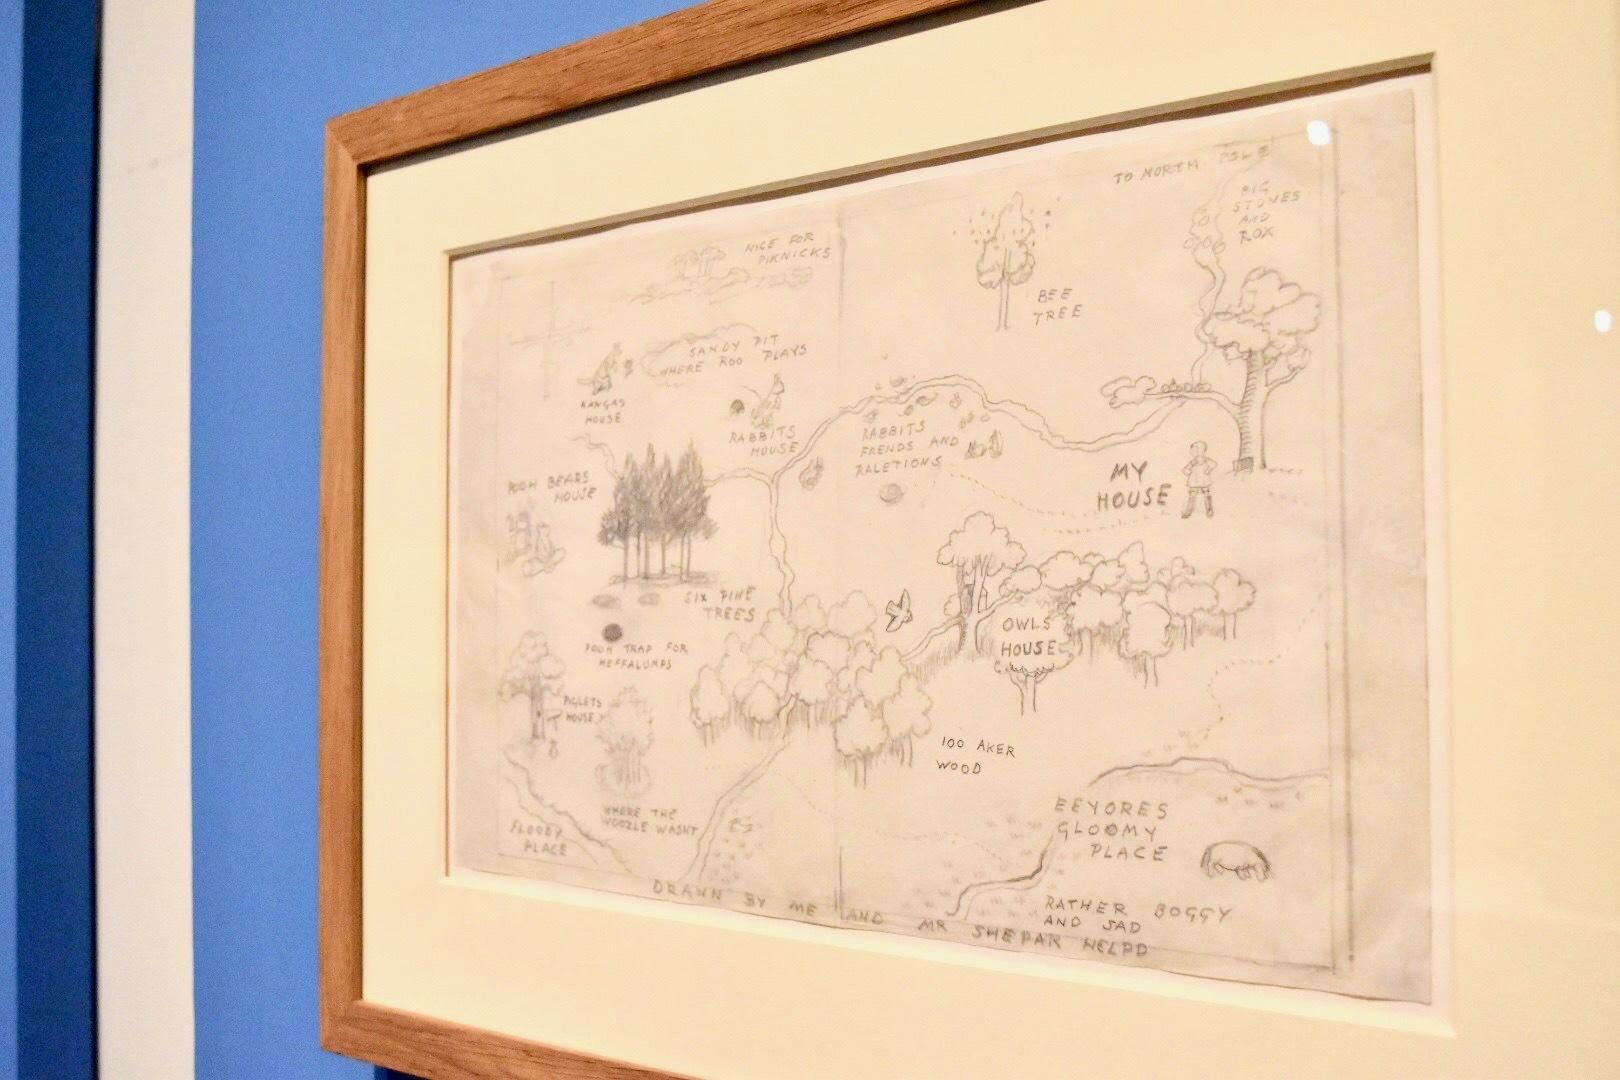 E.H.シェパード 百ちょ森(百町森)の地図『クマのプーさん』見返し 1926年 ヴィクトリア・アンド・アルバート博物館所蔵